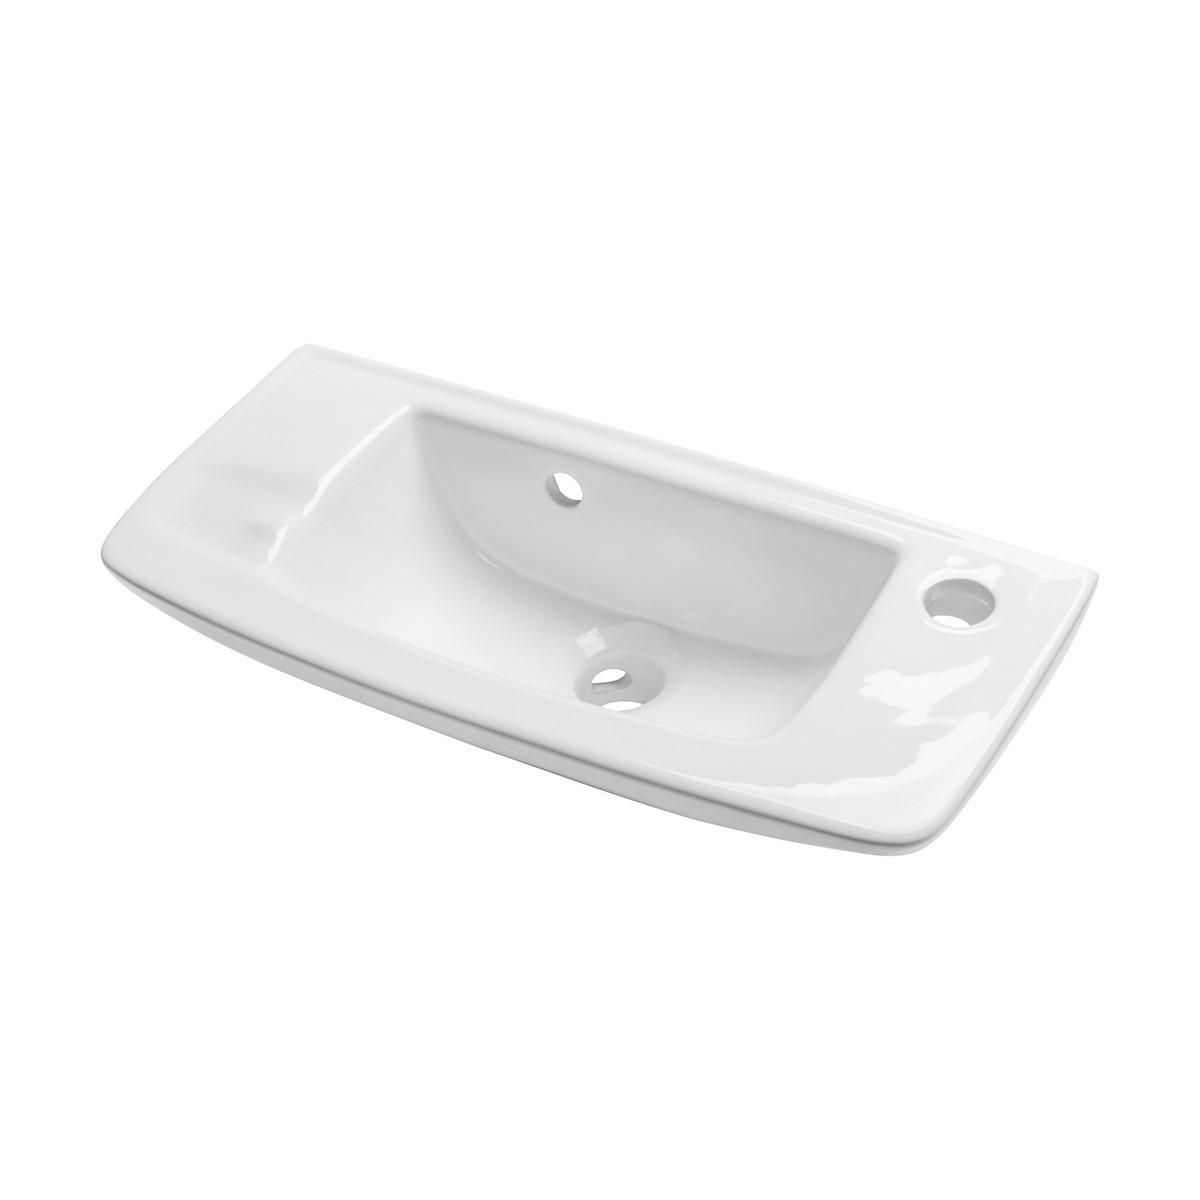 Image of: Renovators Supply Portsmouth Small Bathroom Corner Pedestal Sink White Ceramic Glossy Finish 32 3 4 Height 22 Wide Includes Sink Basin Pedestal And Mounting Bracket Space Saving Design Corner Sinks